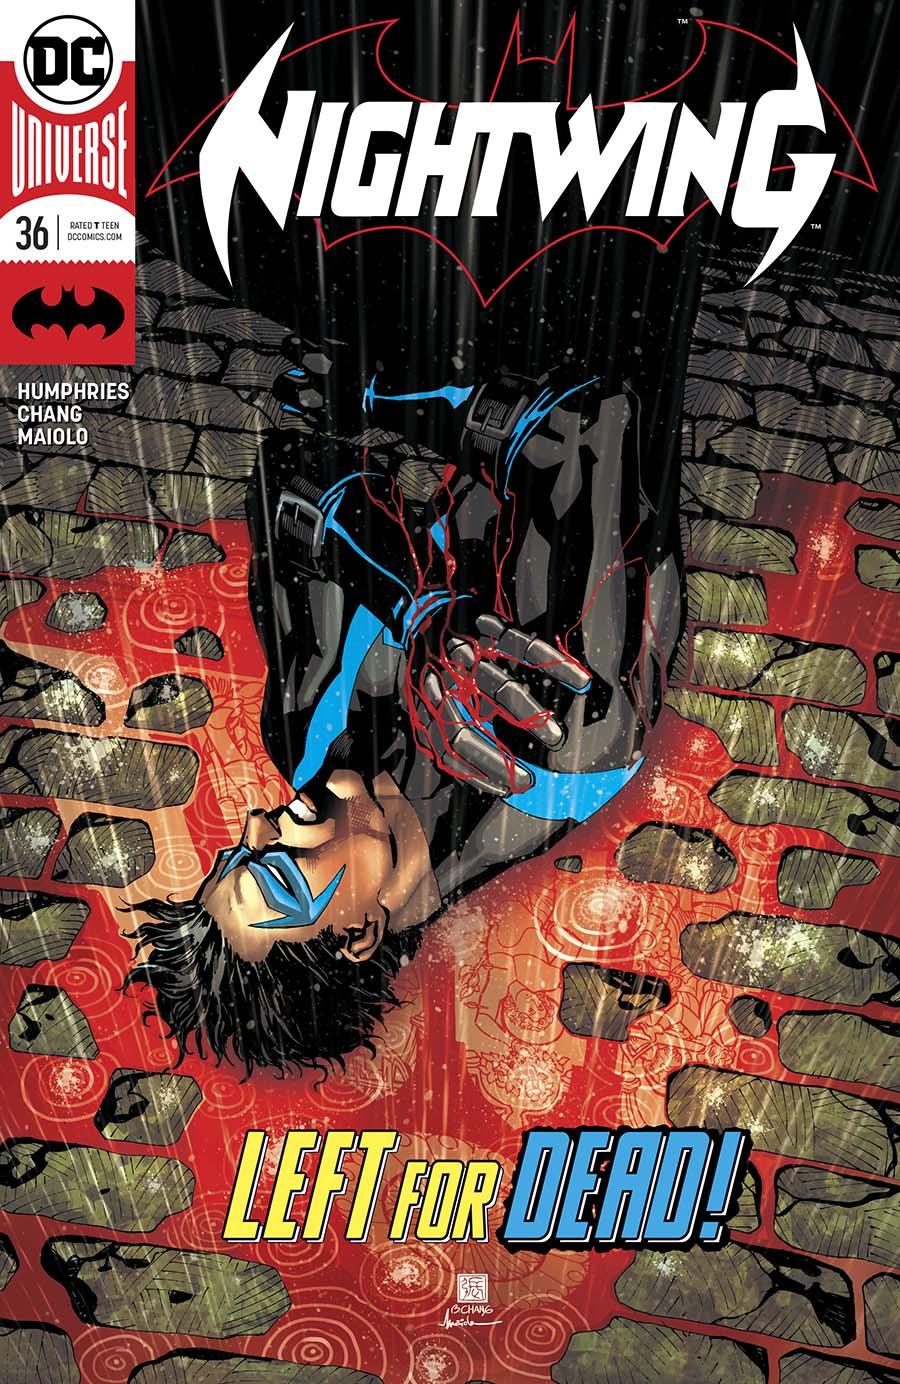 Nightwing Vol 4 #36 Cover A Regular Bernard Chang Cover